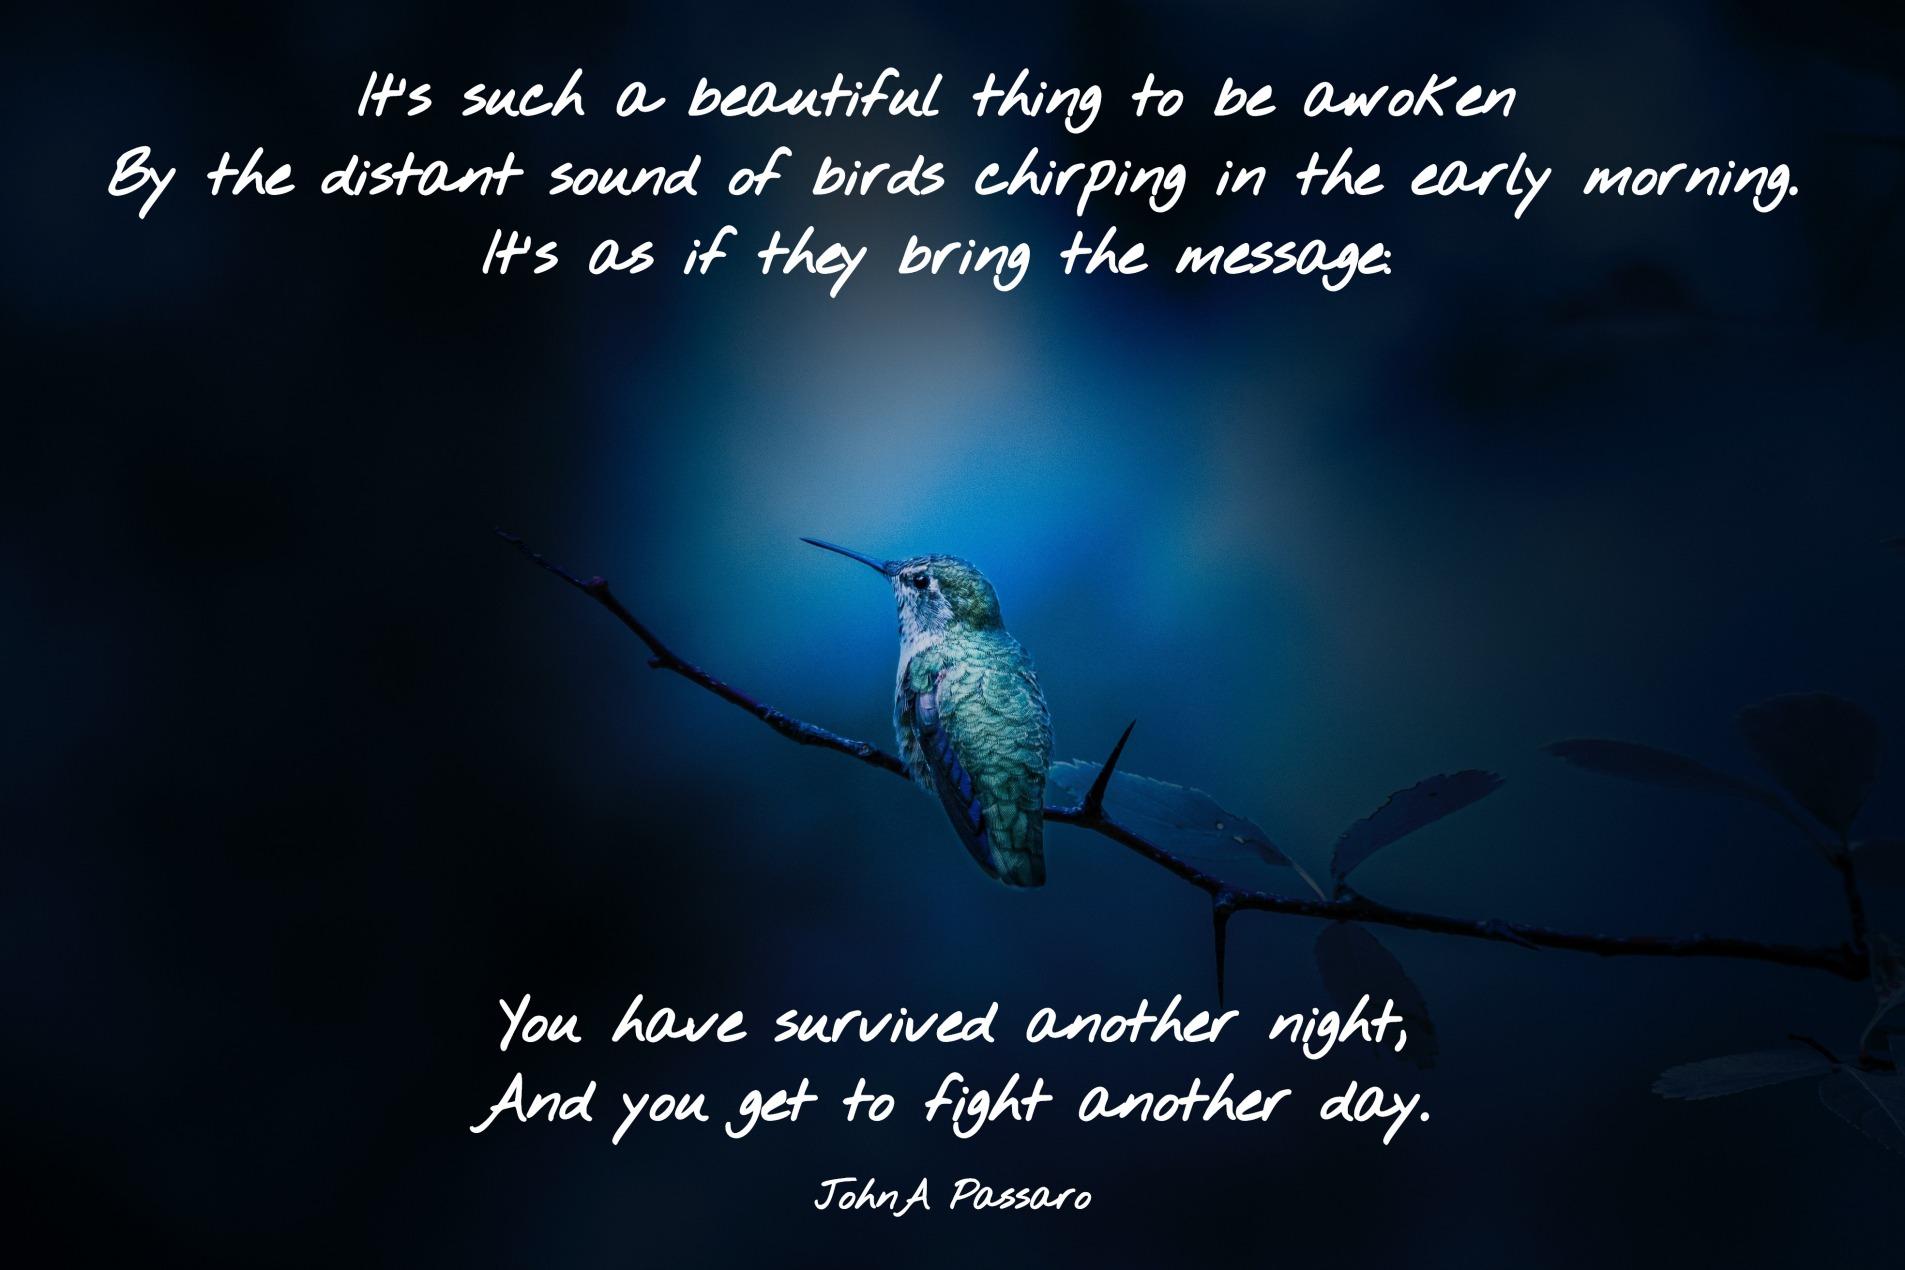 Birdatnight-